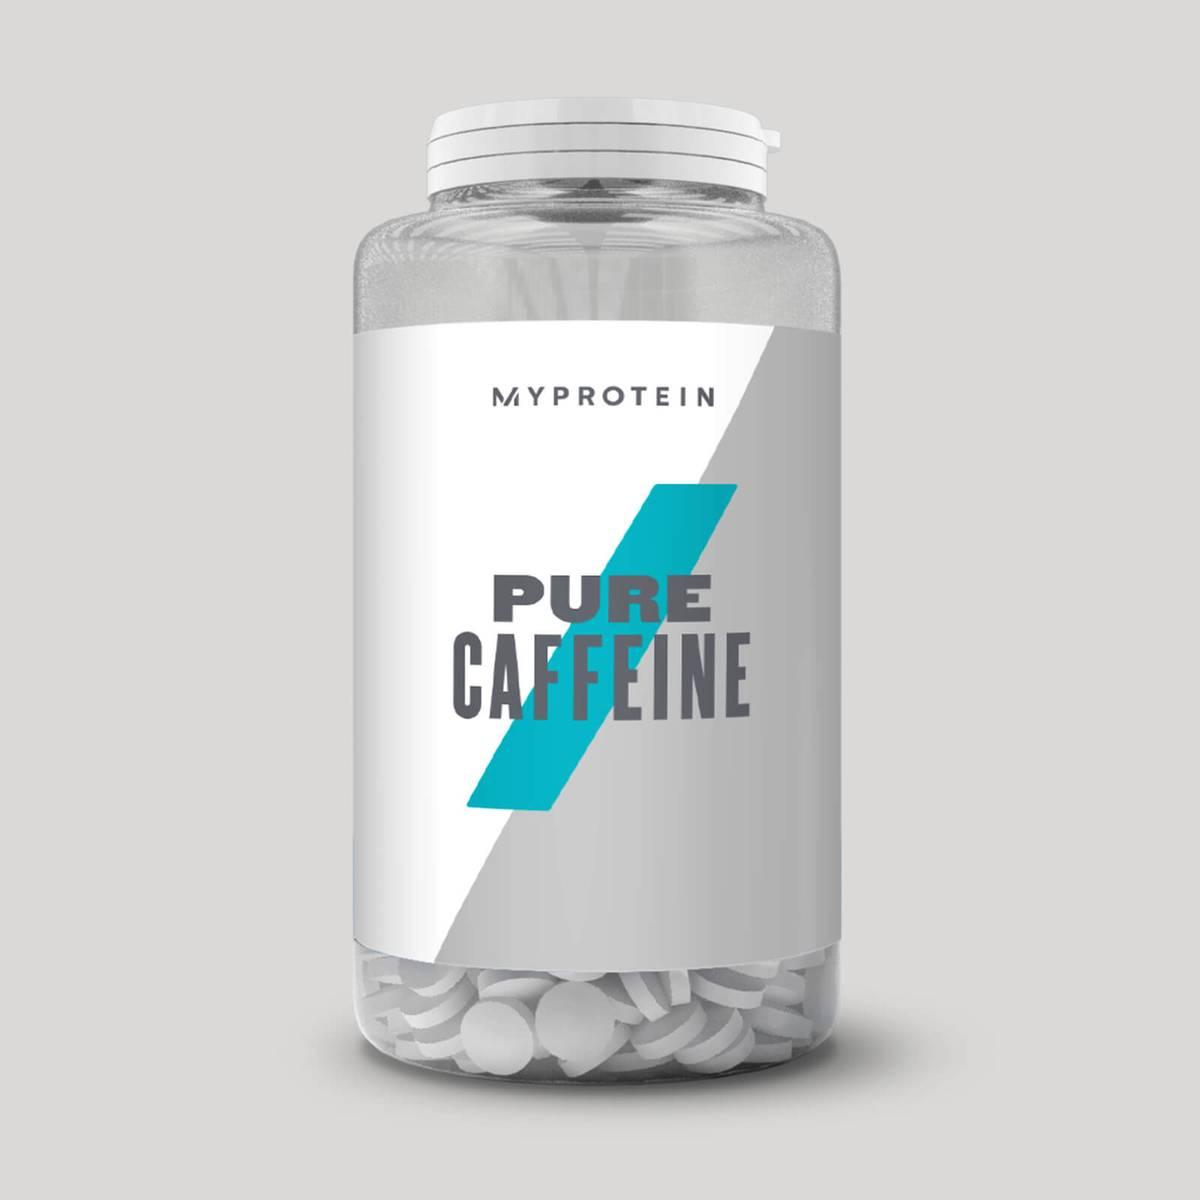 Nejlepší kofeinové tablety